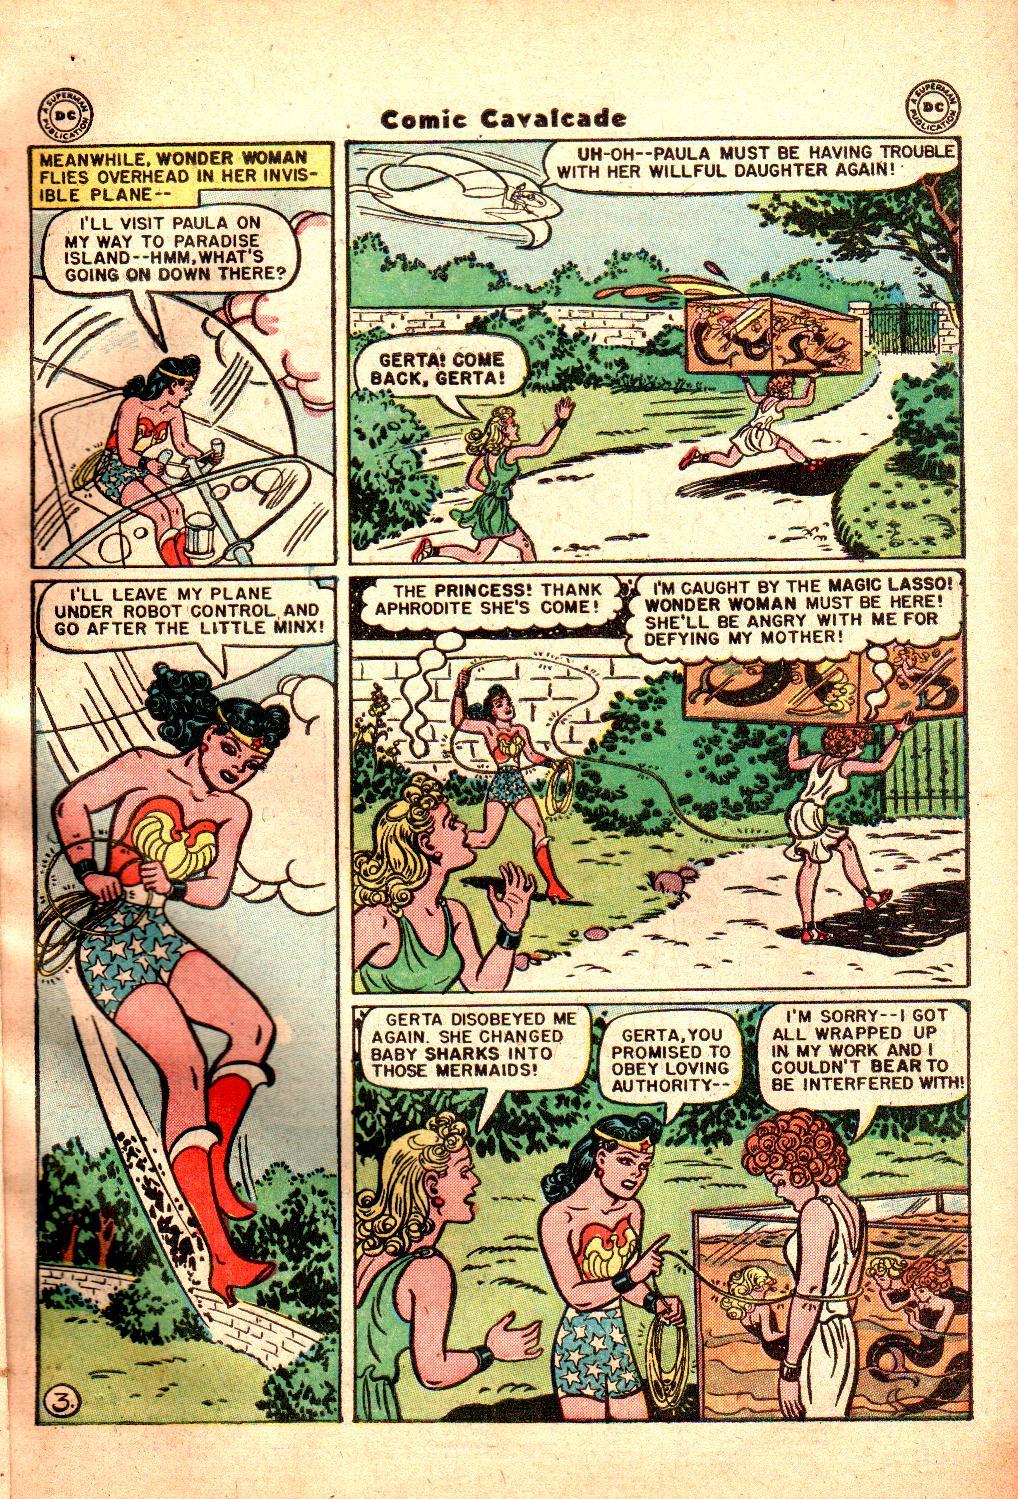 Comic Cavalcade issue 21 - Page 5